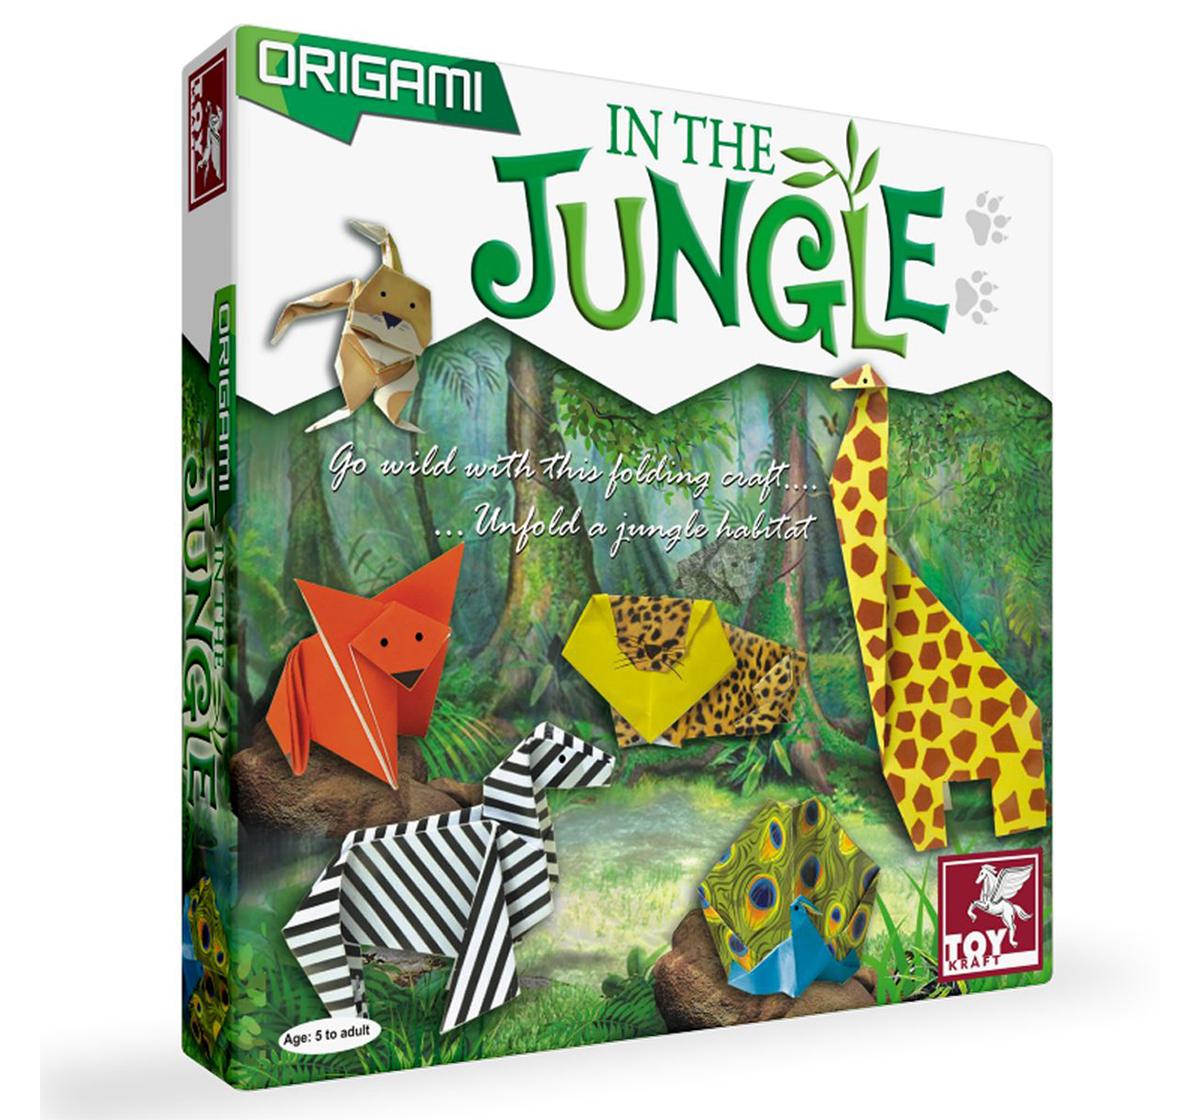 Toy Kraft | Toy Kraft Origami - In The Jungle, Multicolor, 5Y+